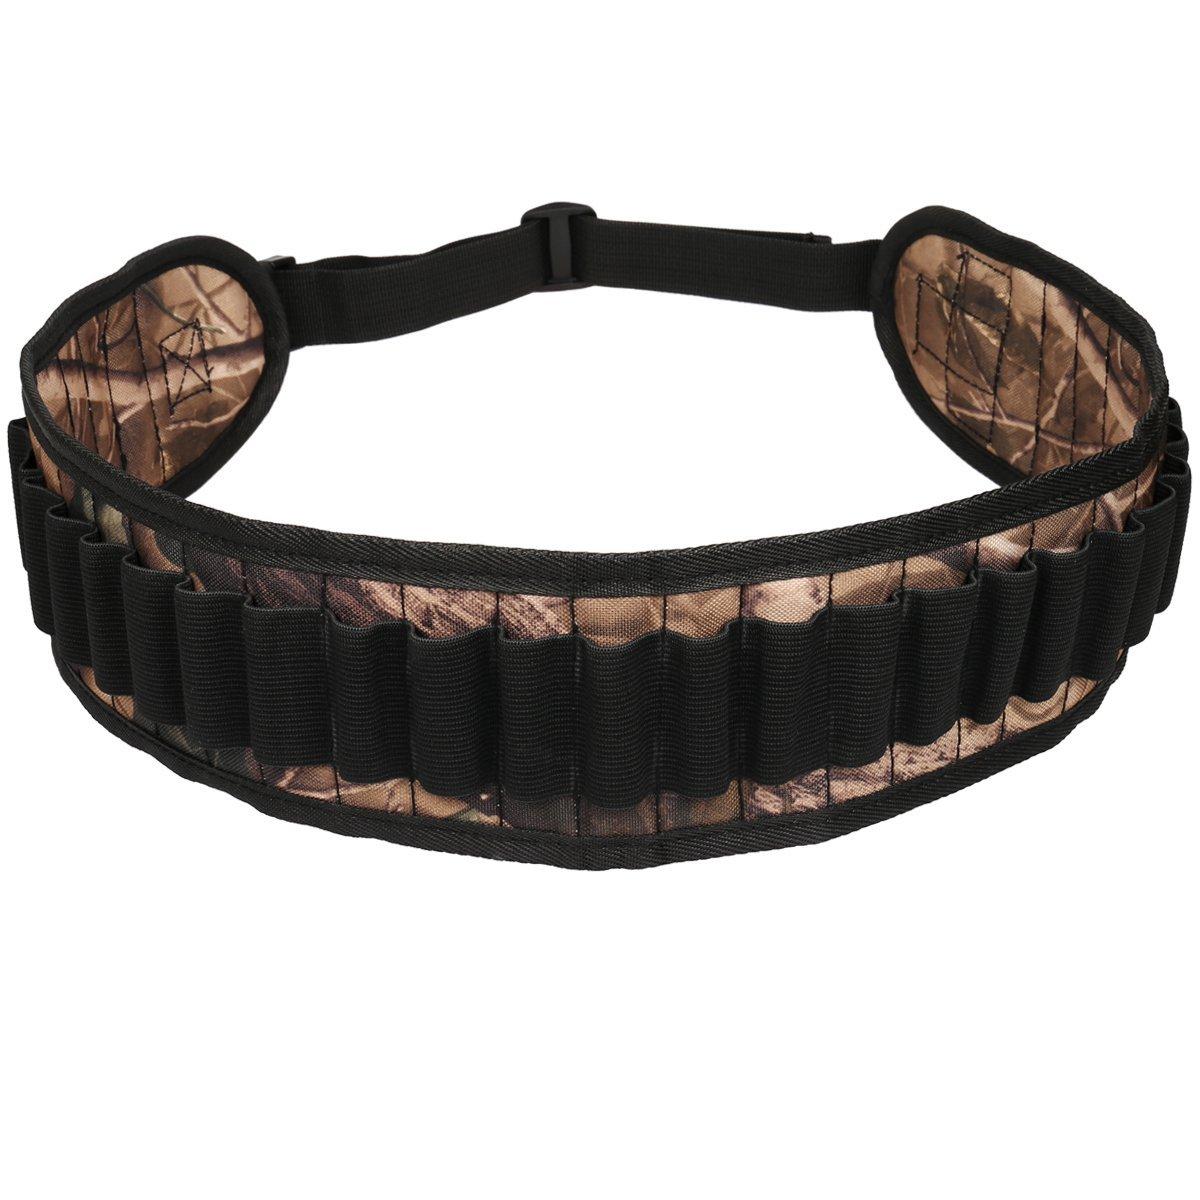 Three Belts. Capable Guide Gear Shotgun Ammo Belts Sporting Goods